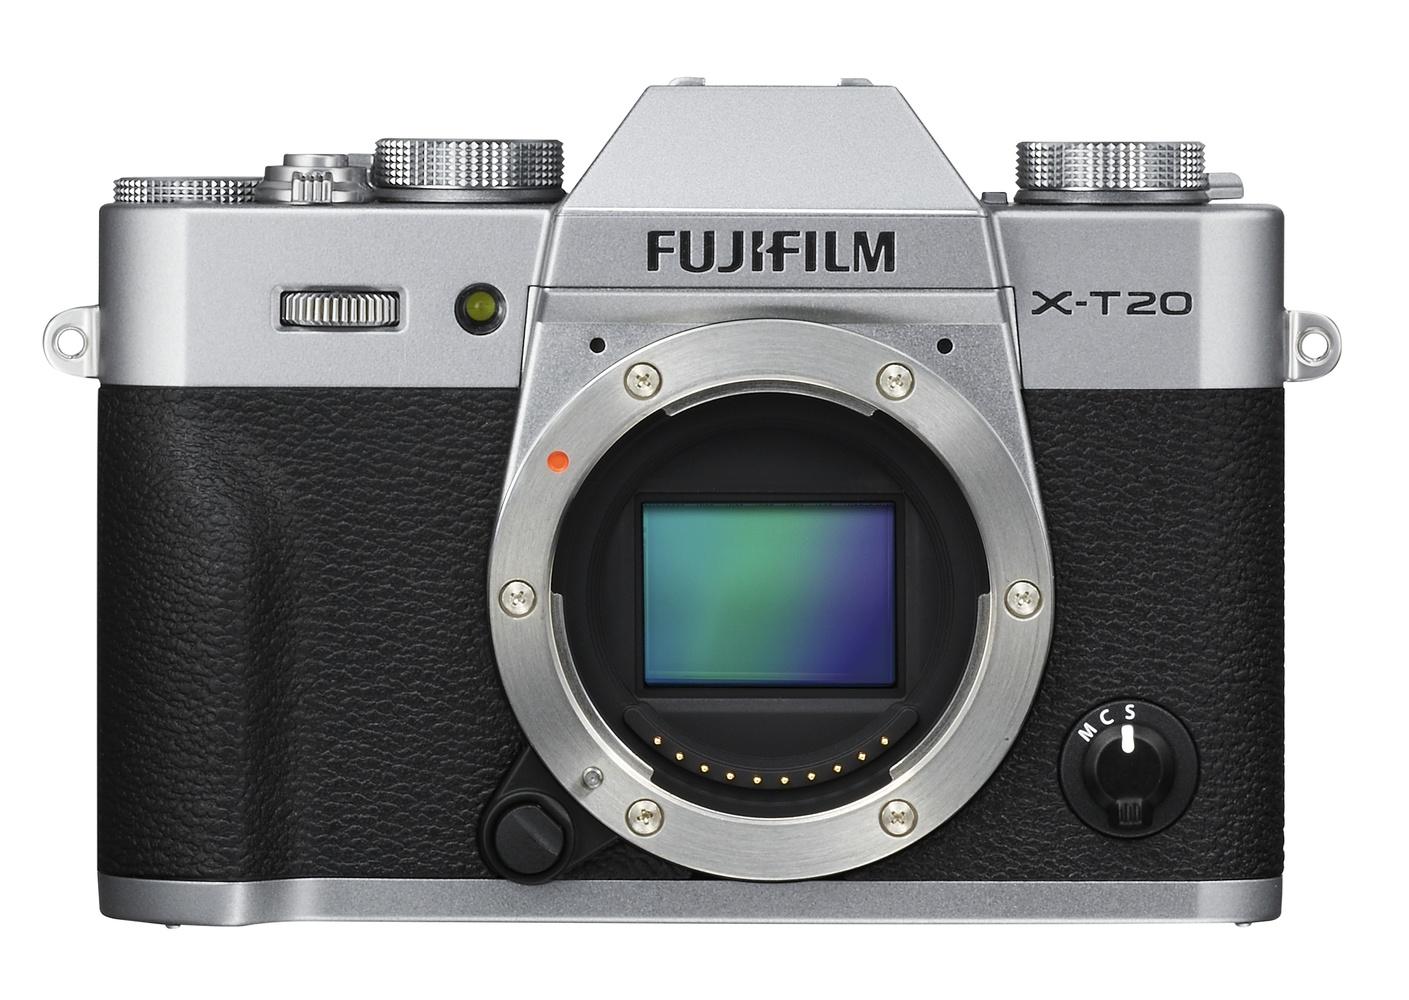 Harga Dan Spek Ultimate Black Friday 2018 Camera Deals Lenses Mango Ma6688l 80 White Silver Fuji Announces X100f And X T20 Cameras Fujinon Xf 50mm F 2 R Wr